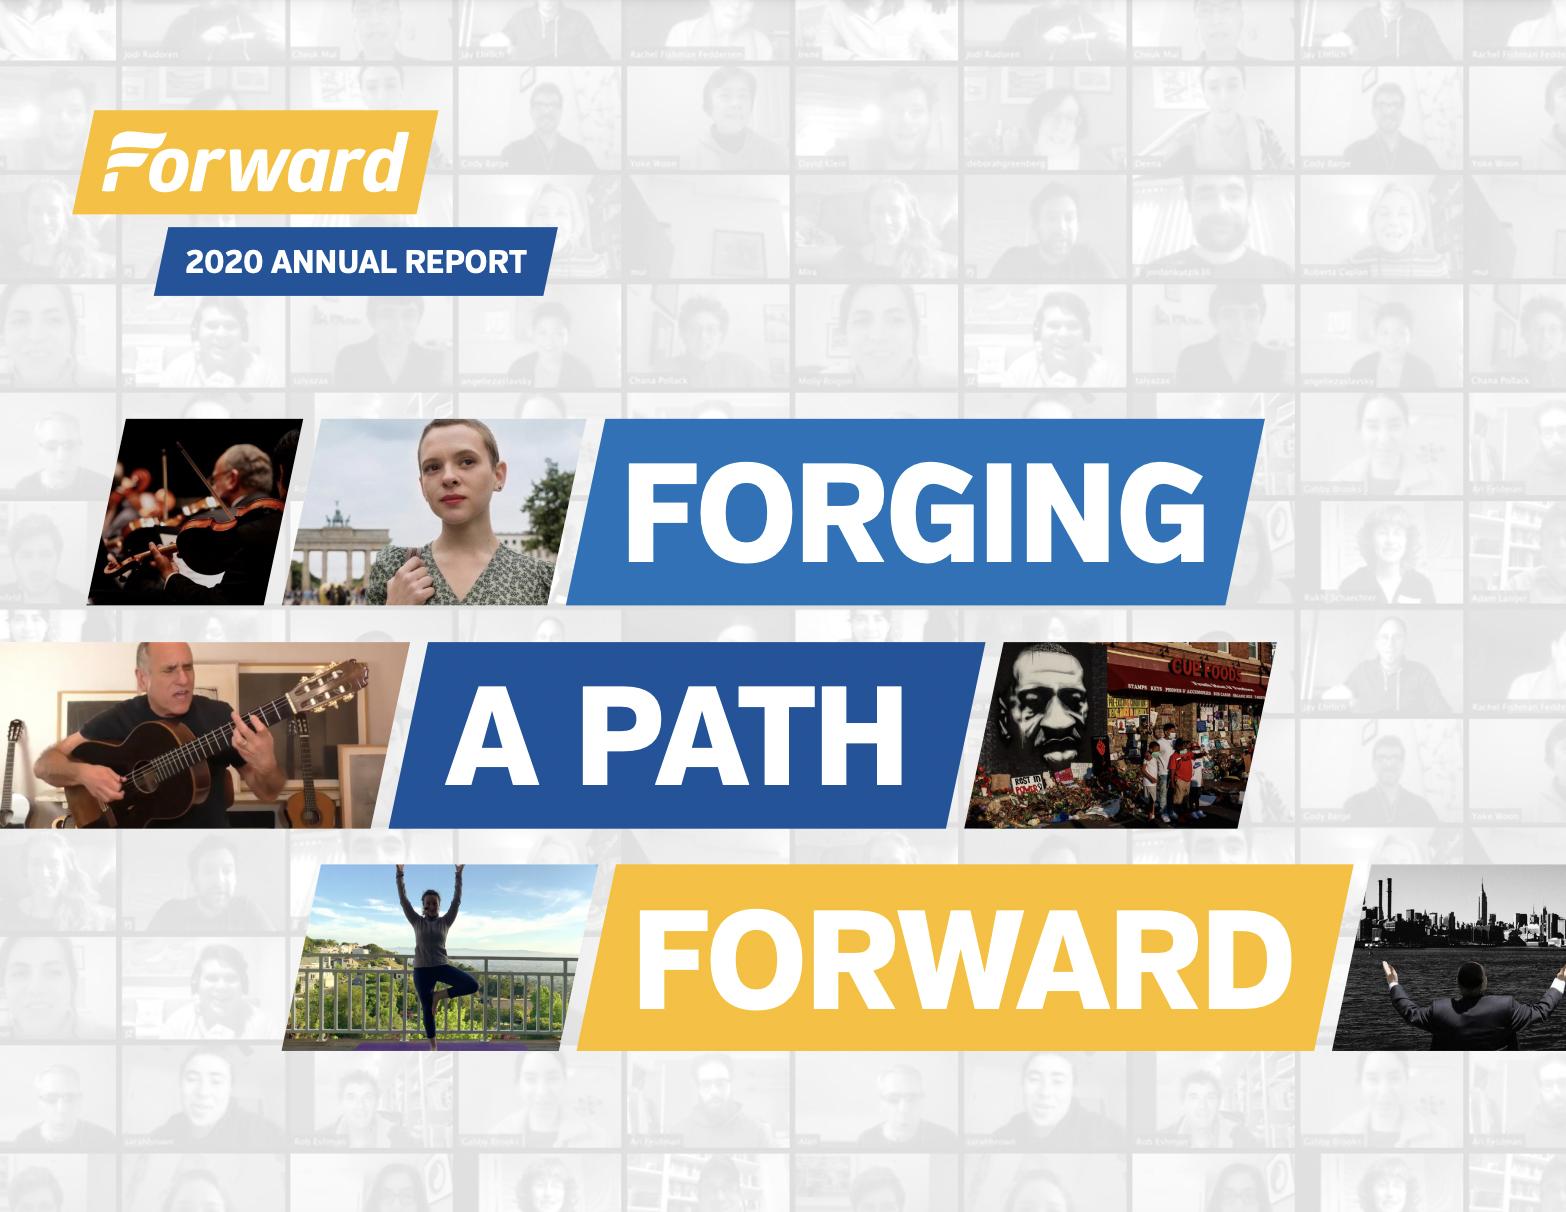 Forward - Forging a Path Forward